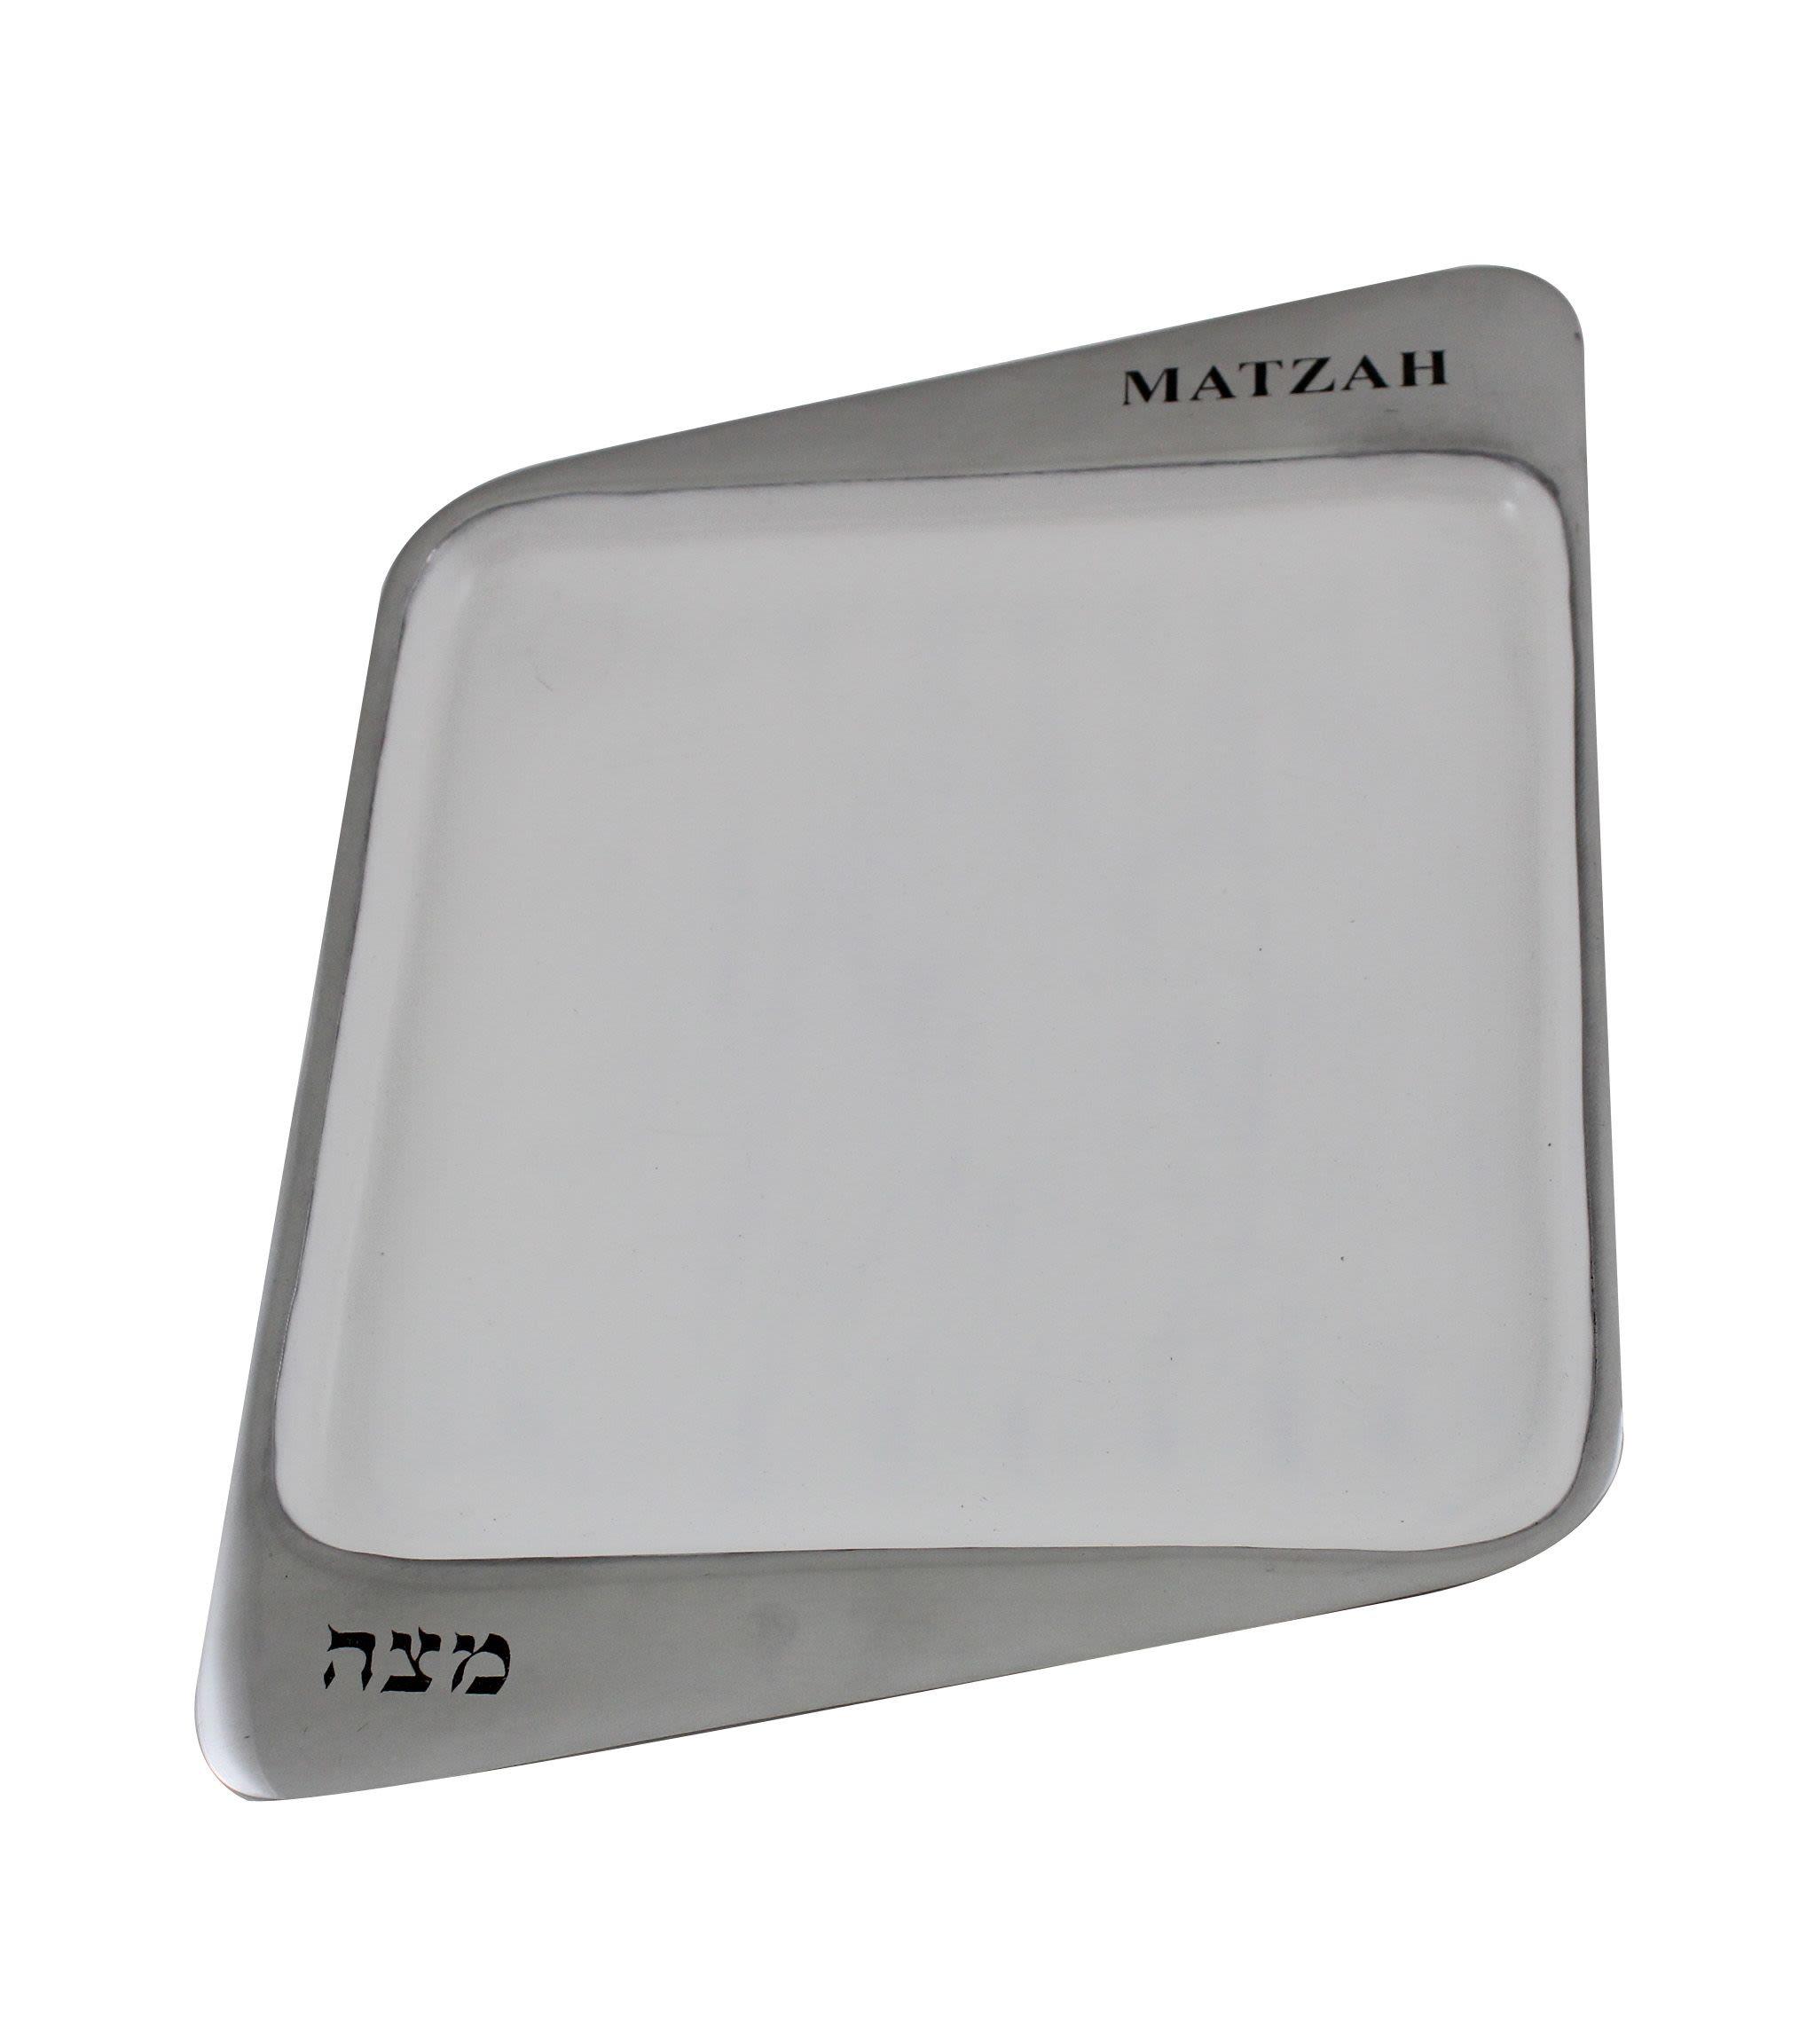 Porcelain Matzah Tray